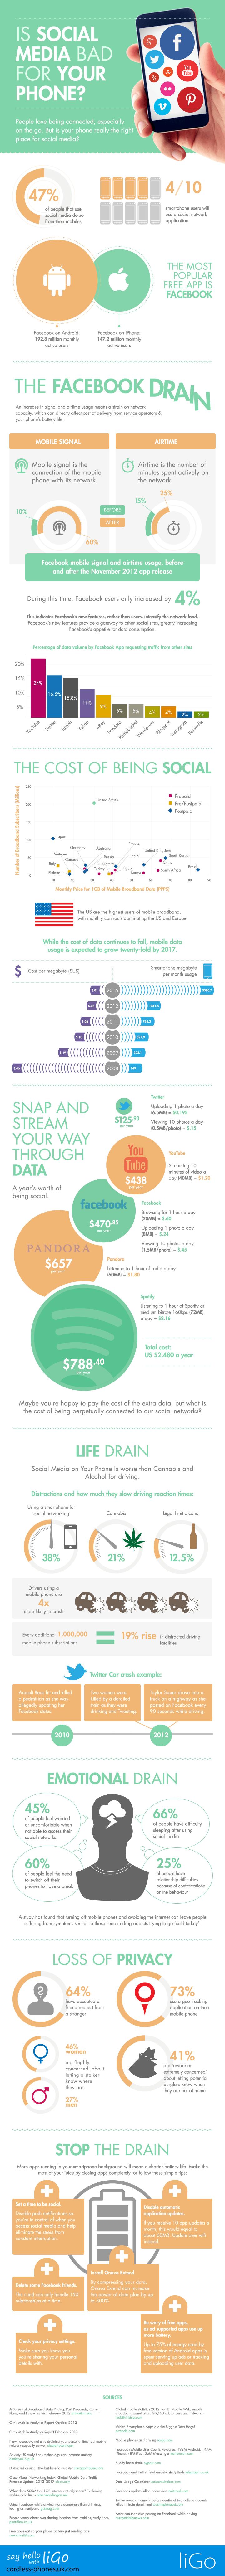 smartphone_social_media_infographic